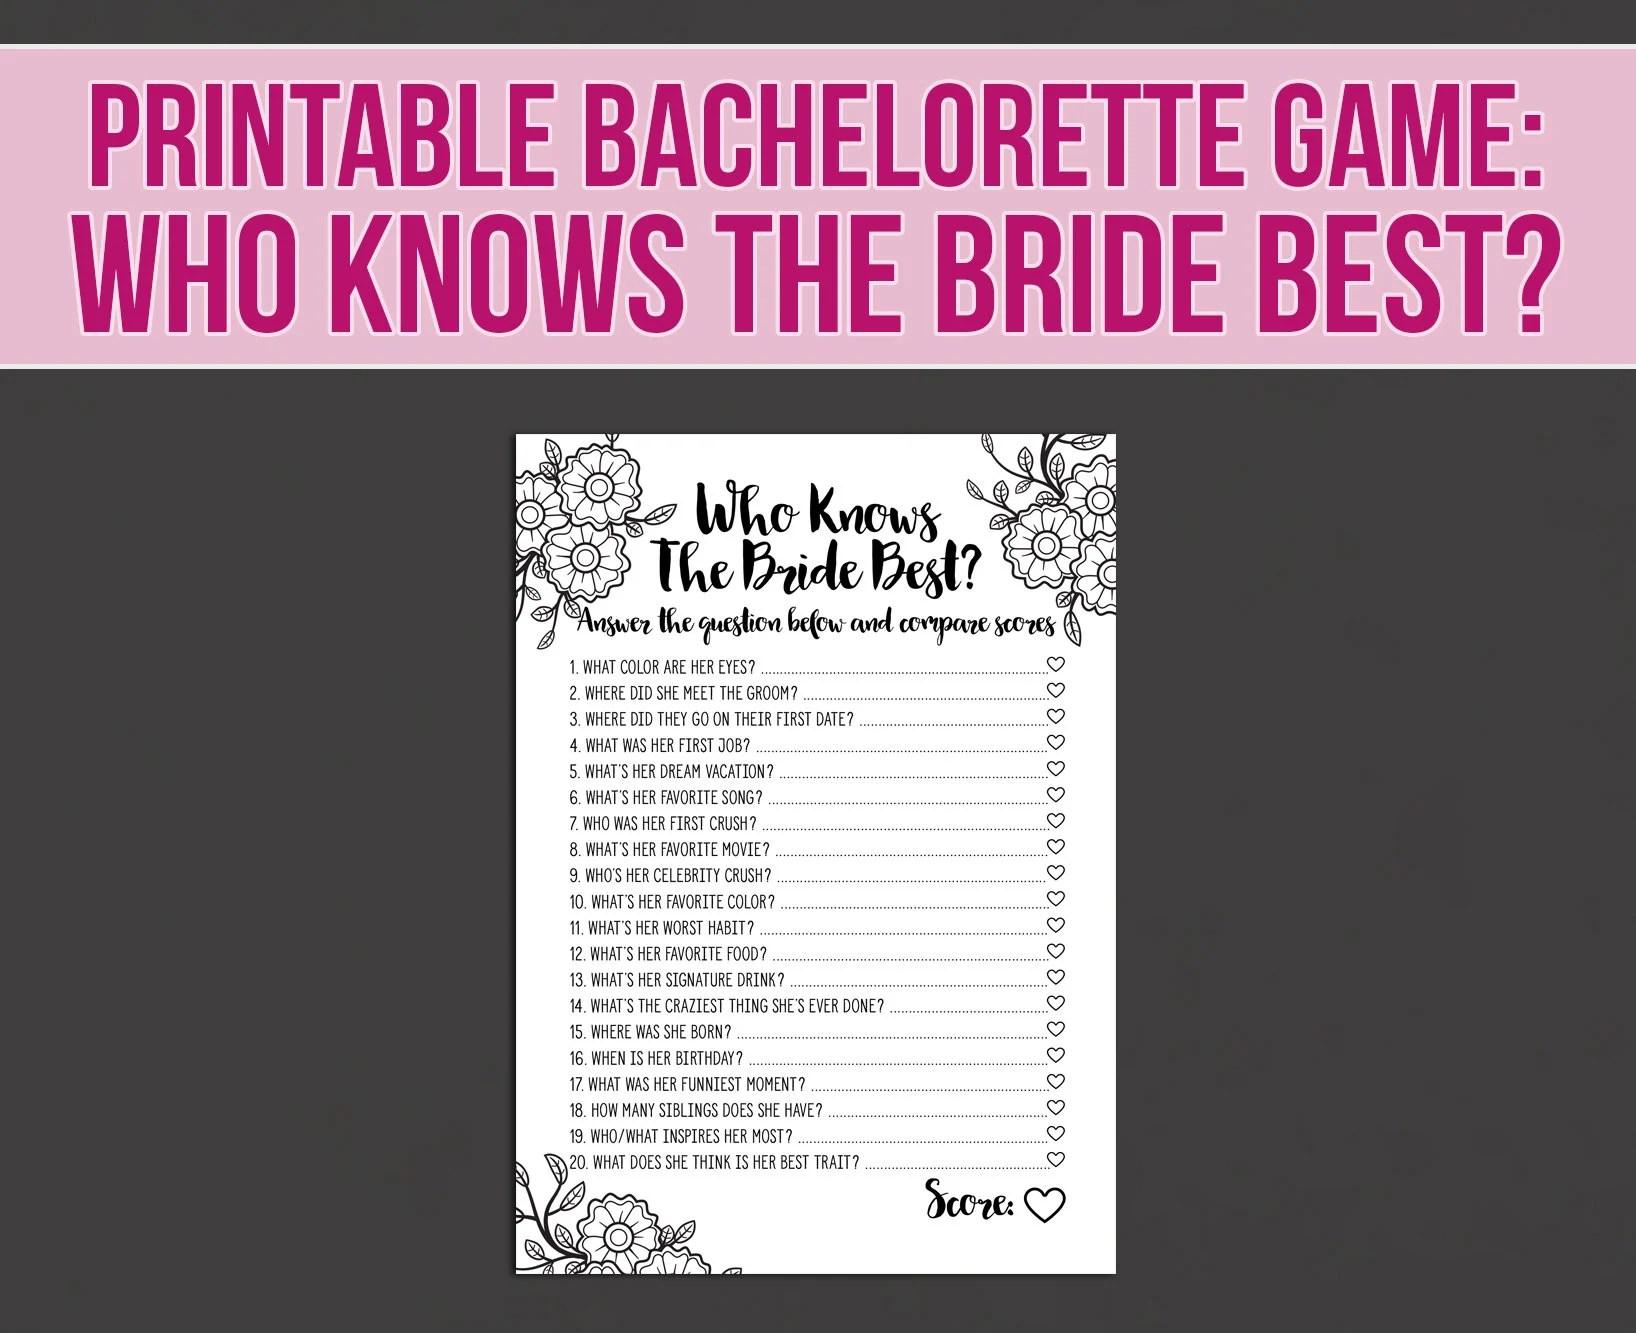 Bachelorette Game Who Knows The Bride Bestfun bachelorette Etsy